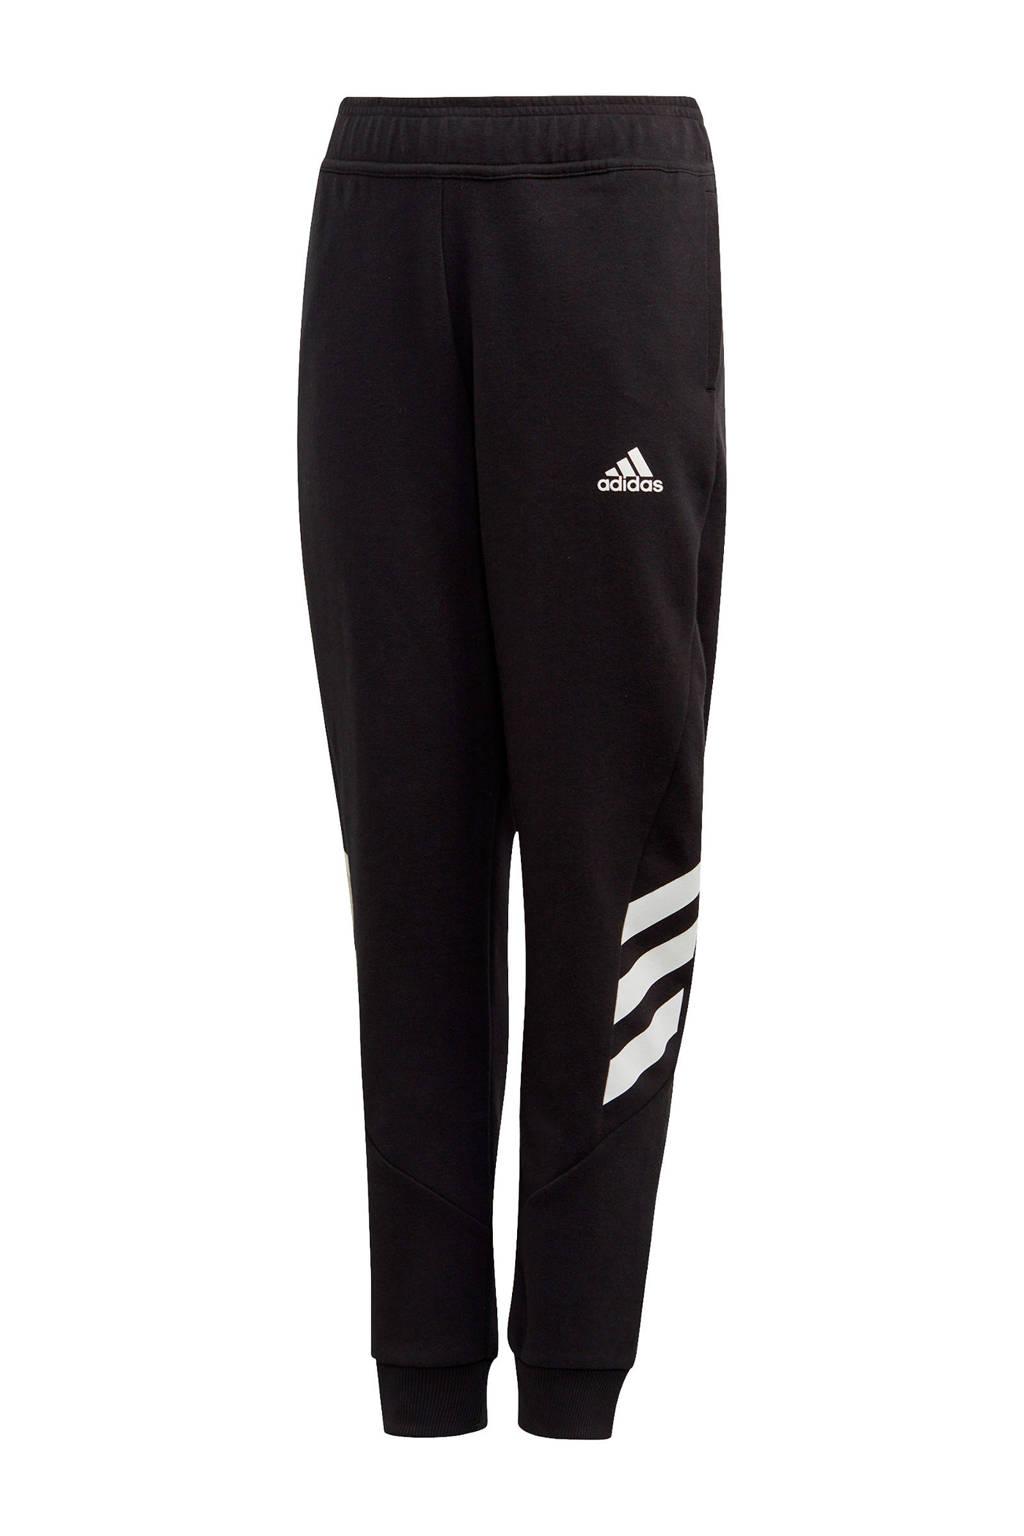 adidas joggingbroek zwart/wit, Zwart/wit